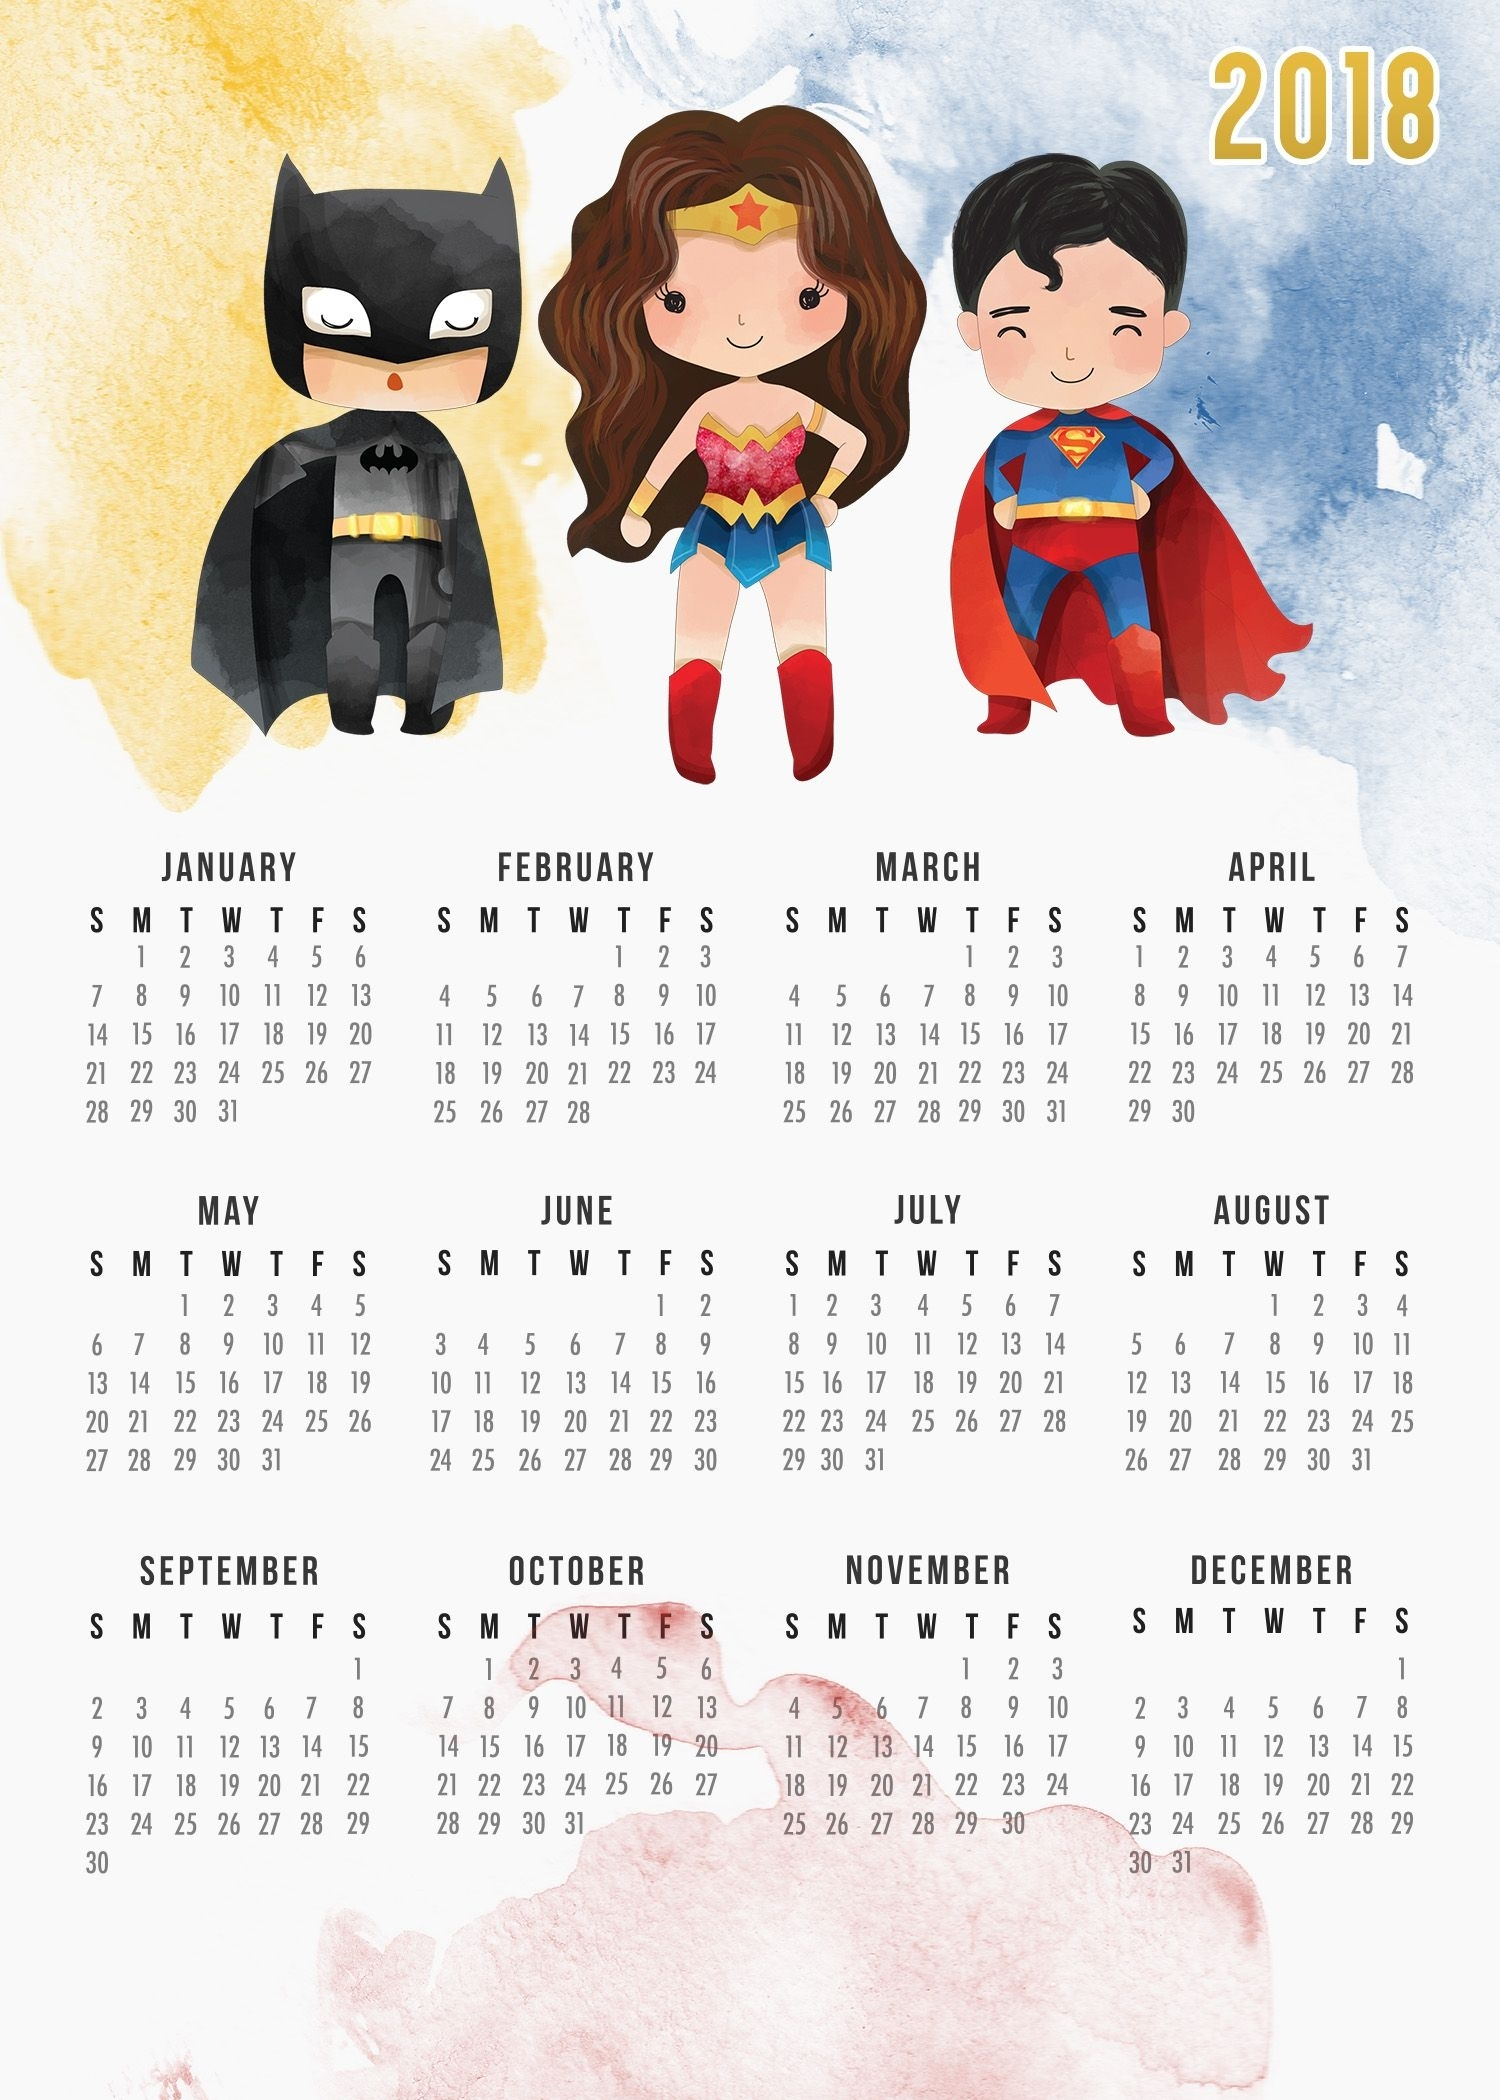 Free Printable 2018 Justice League Calendar | Creativity | Calendar intended for Free Printable Adult Superhero Calendars